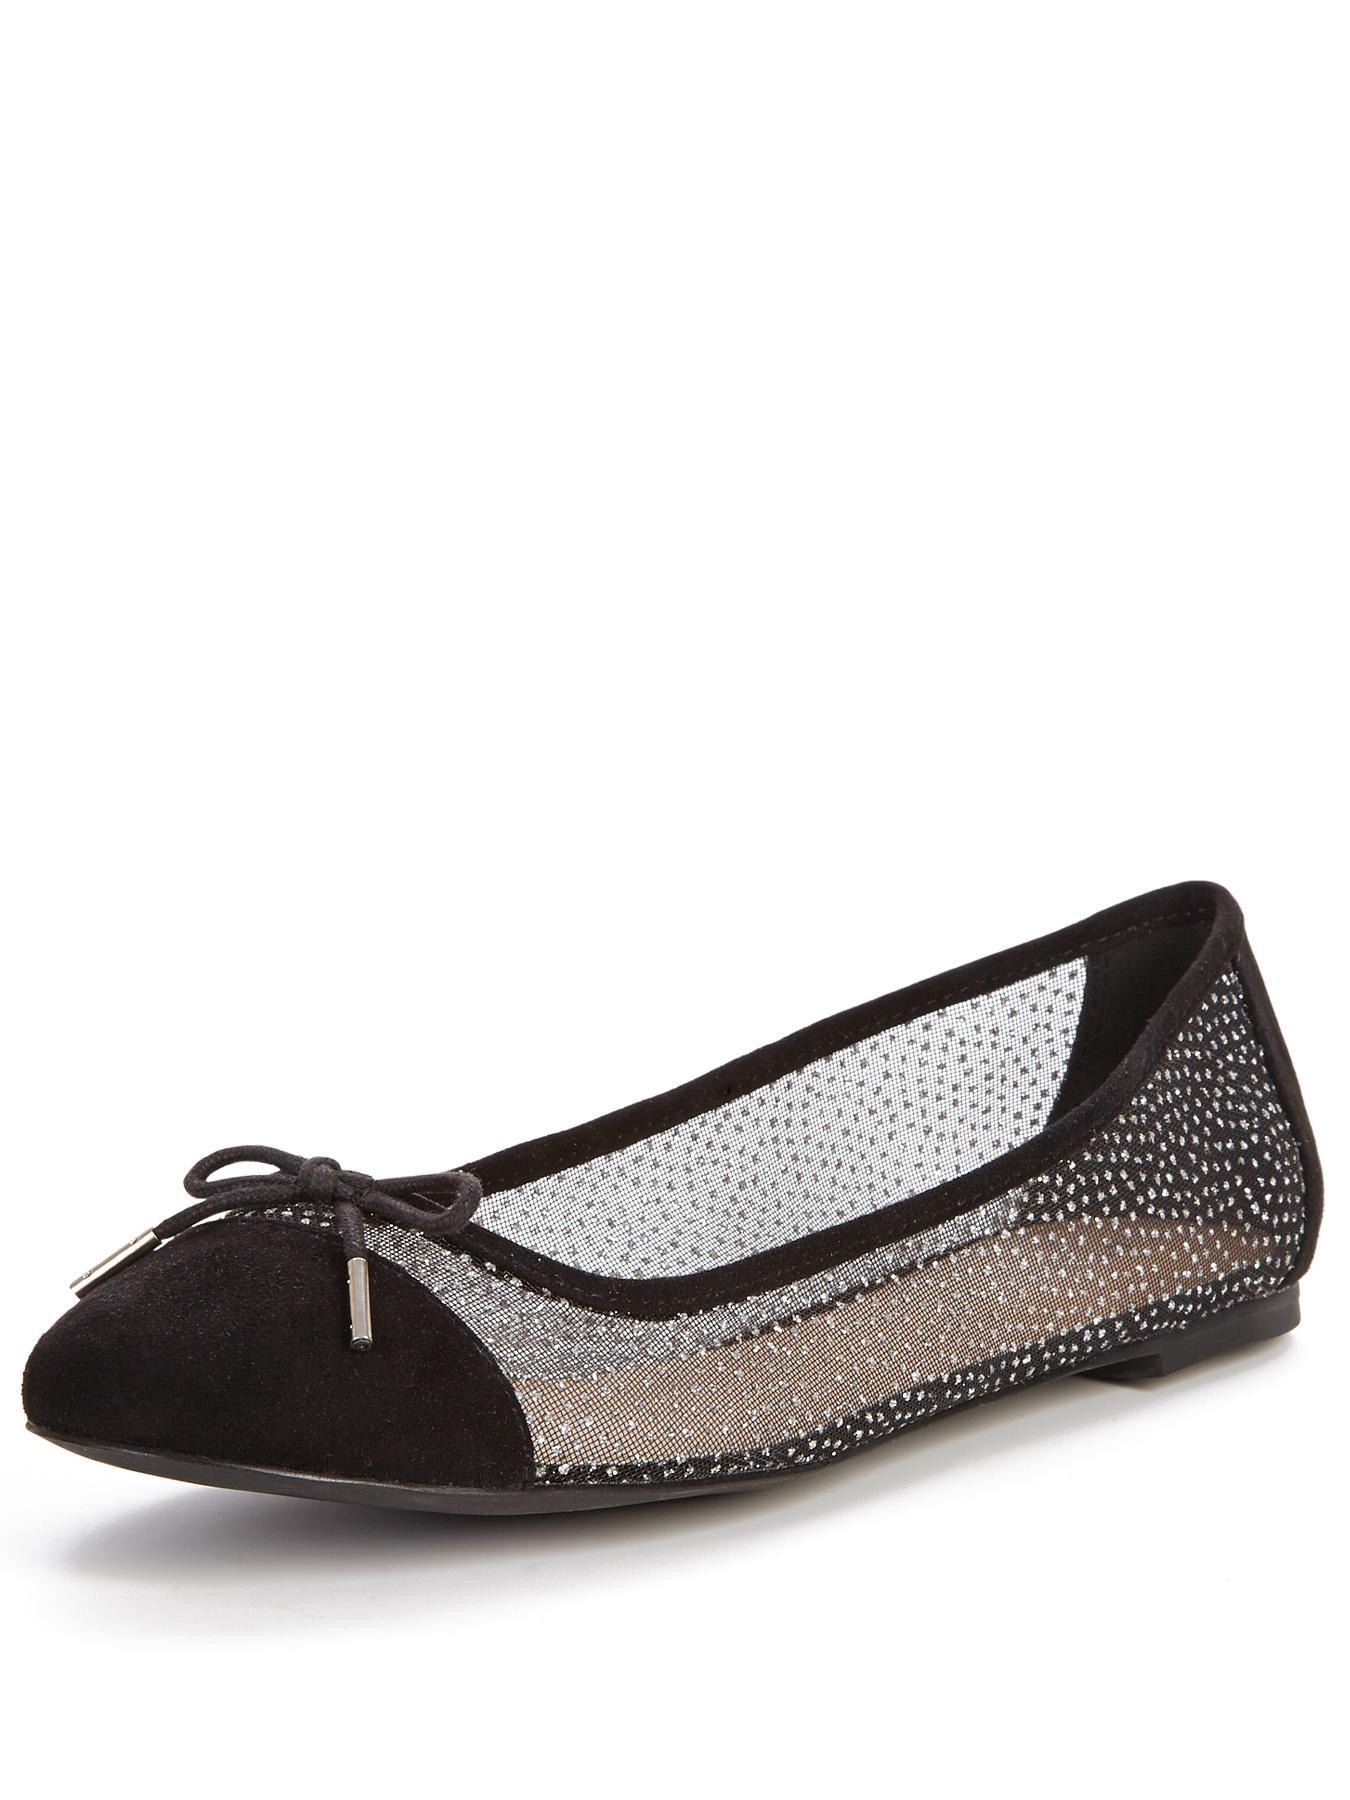 Best Cheapest Wide Shoes Flat Feet